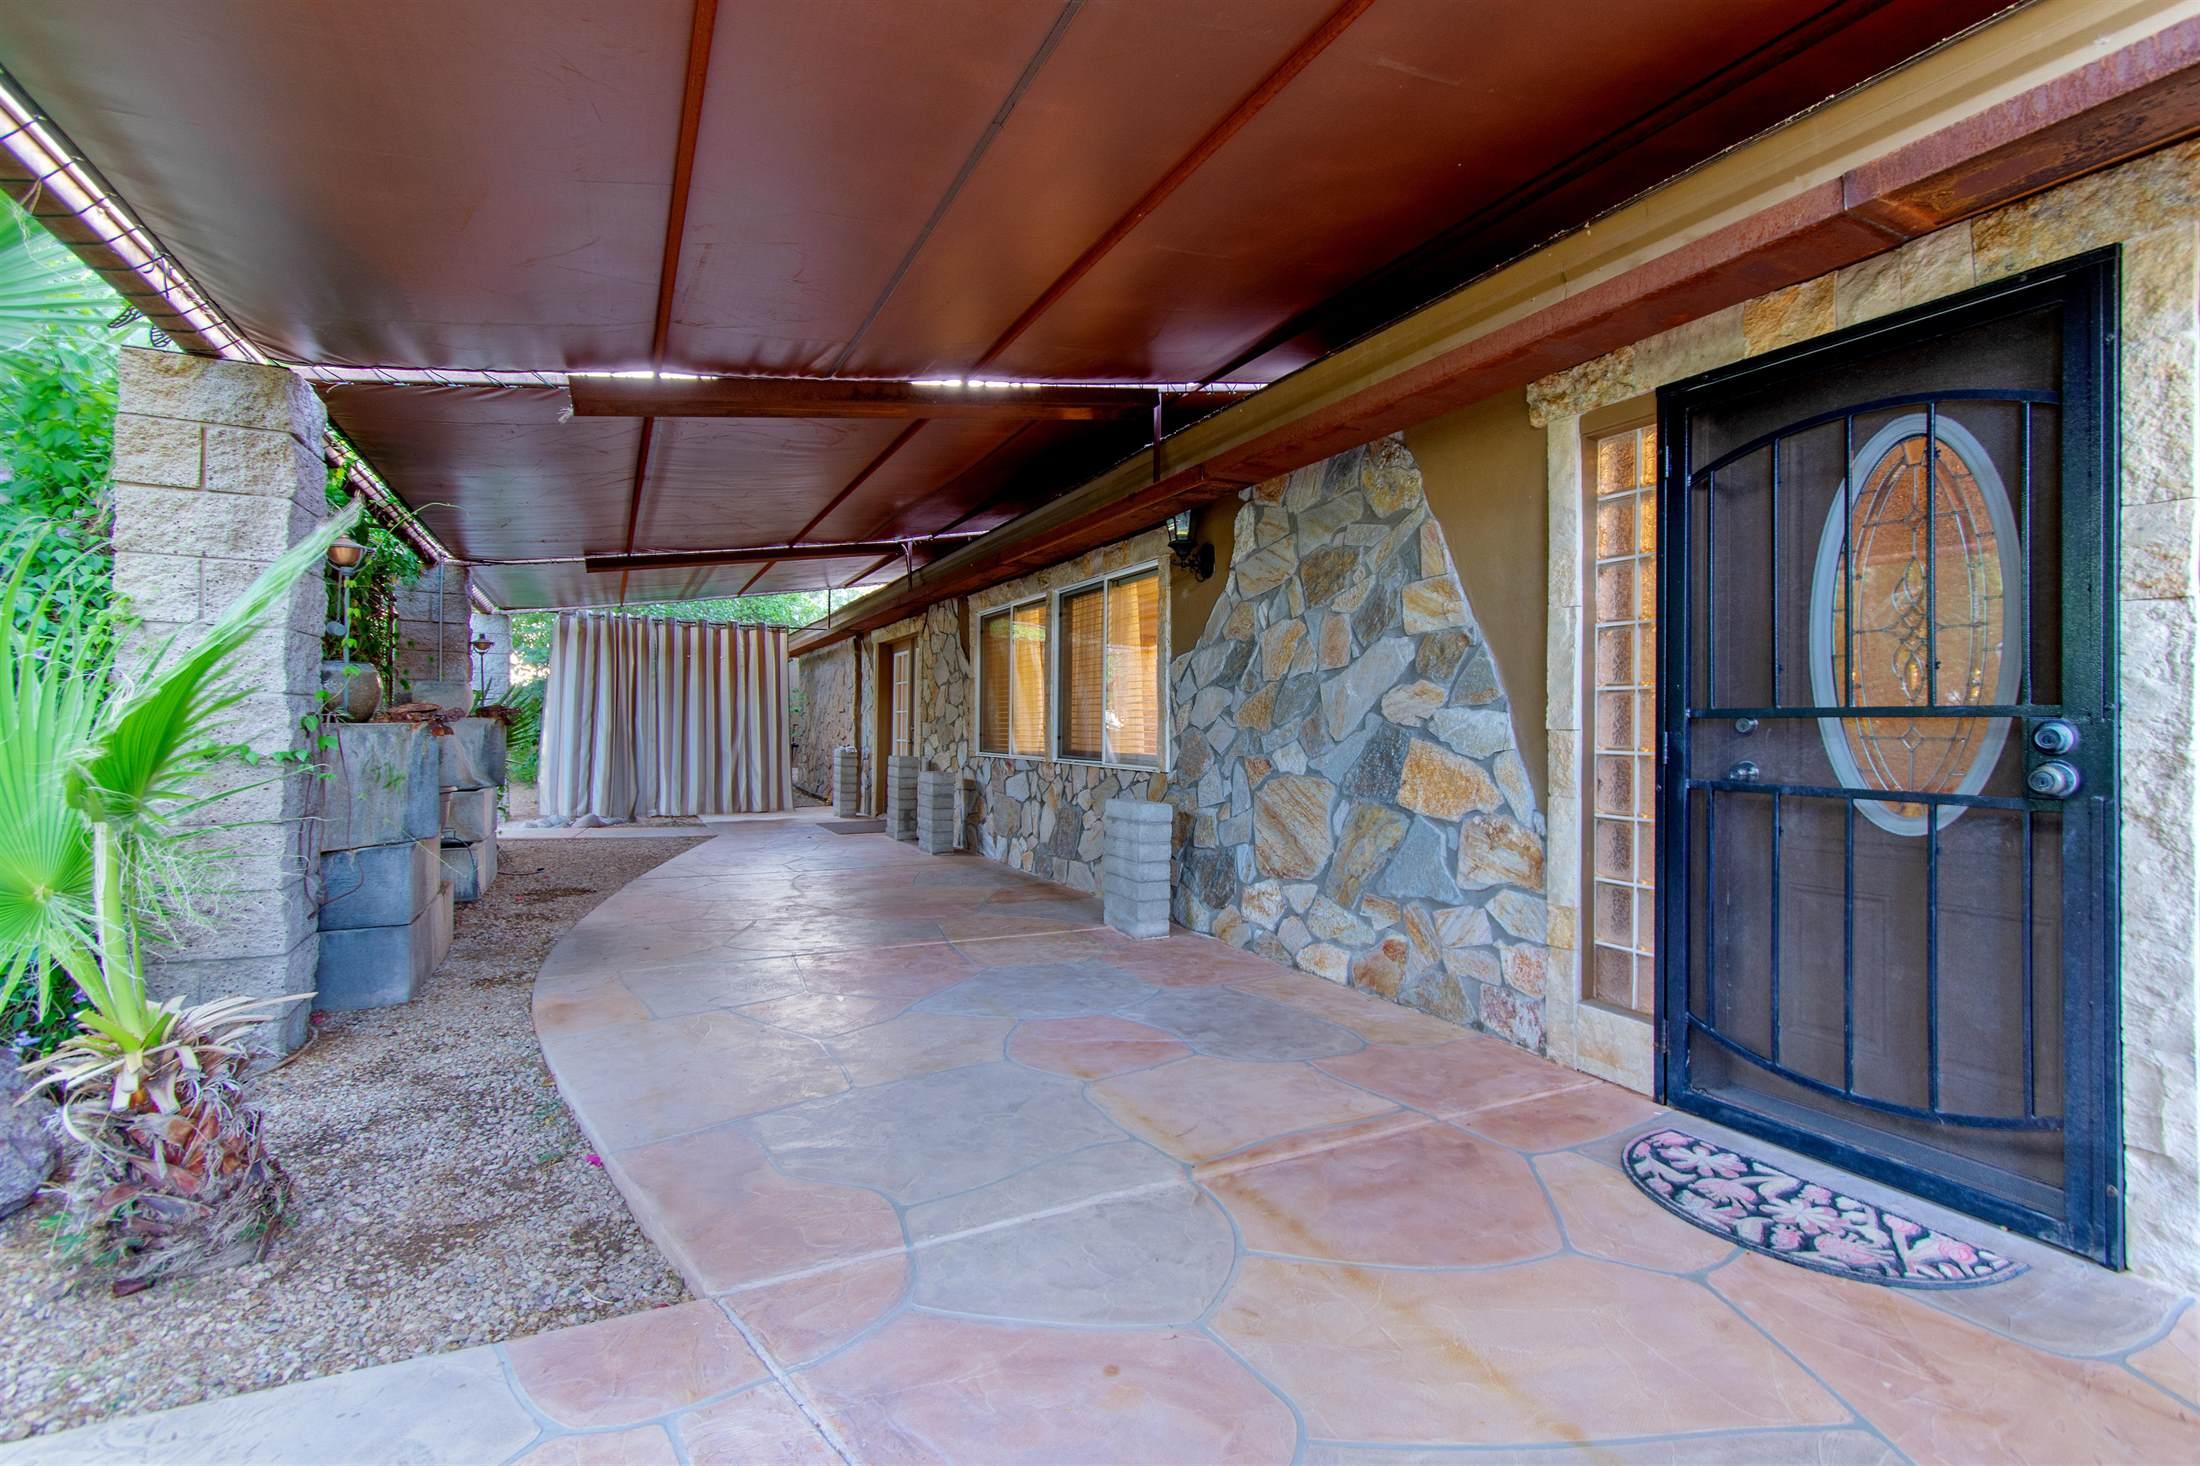 8340 E Thomas Rd, Scottsdale, AZ 85251